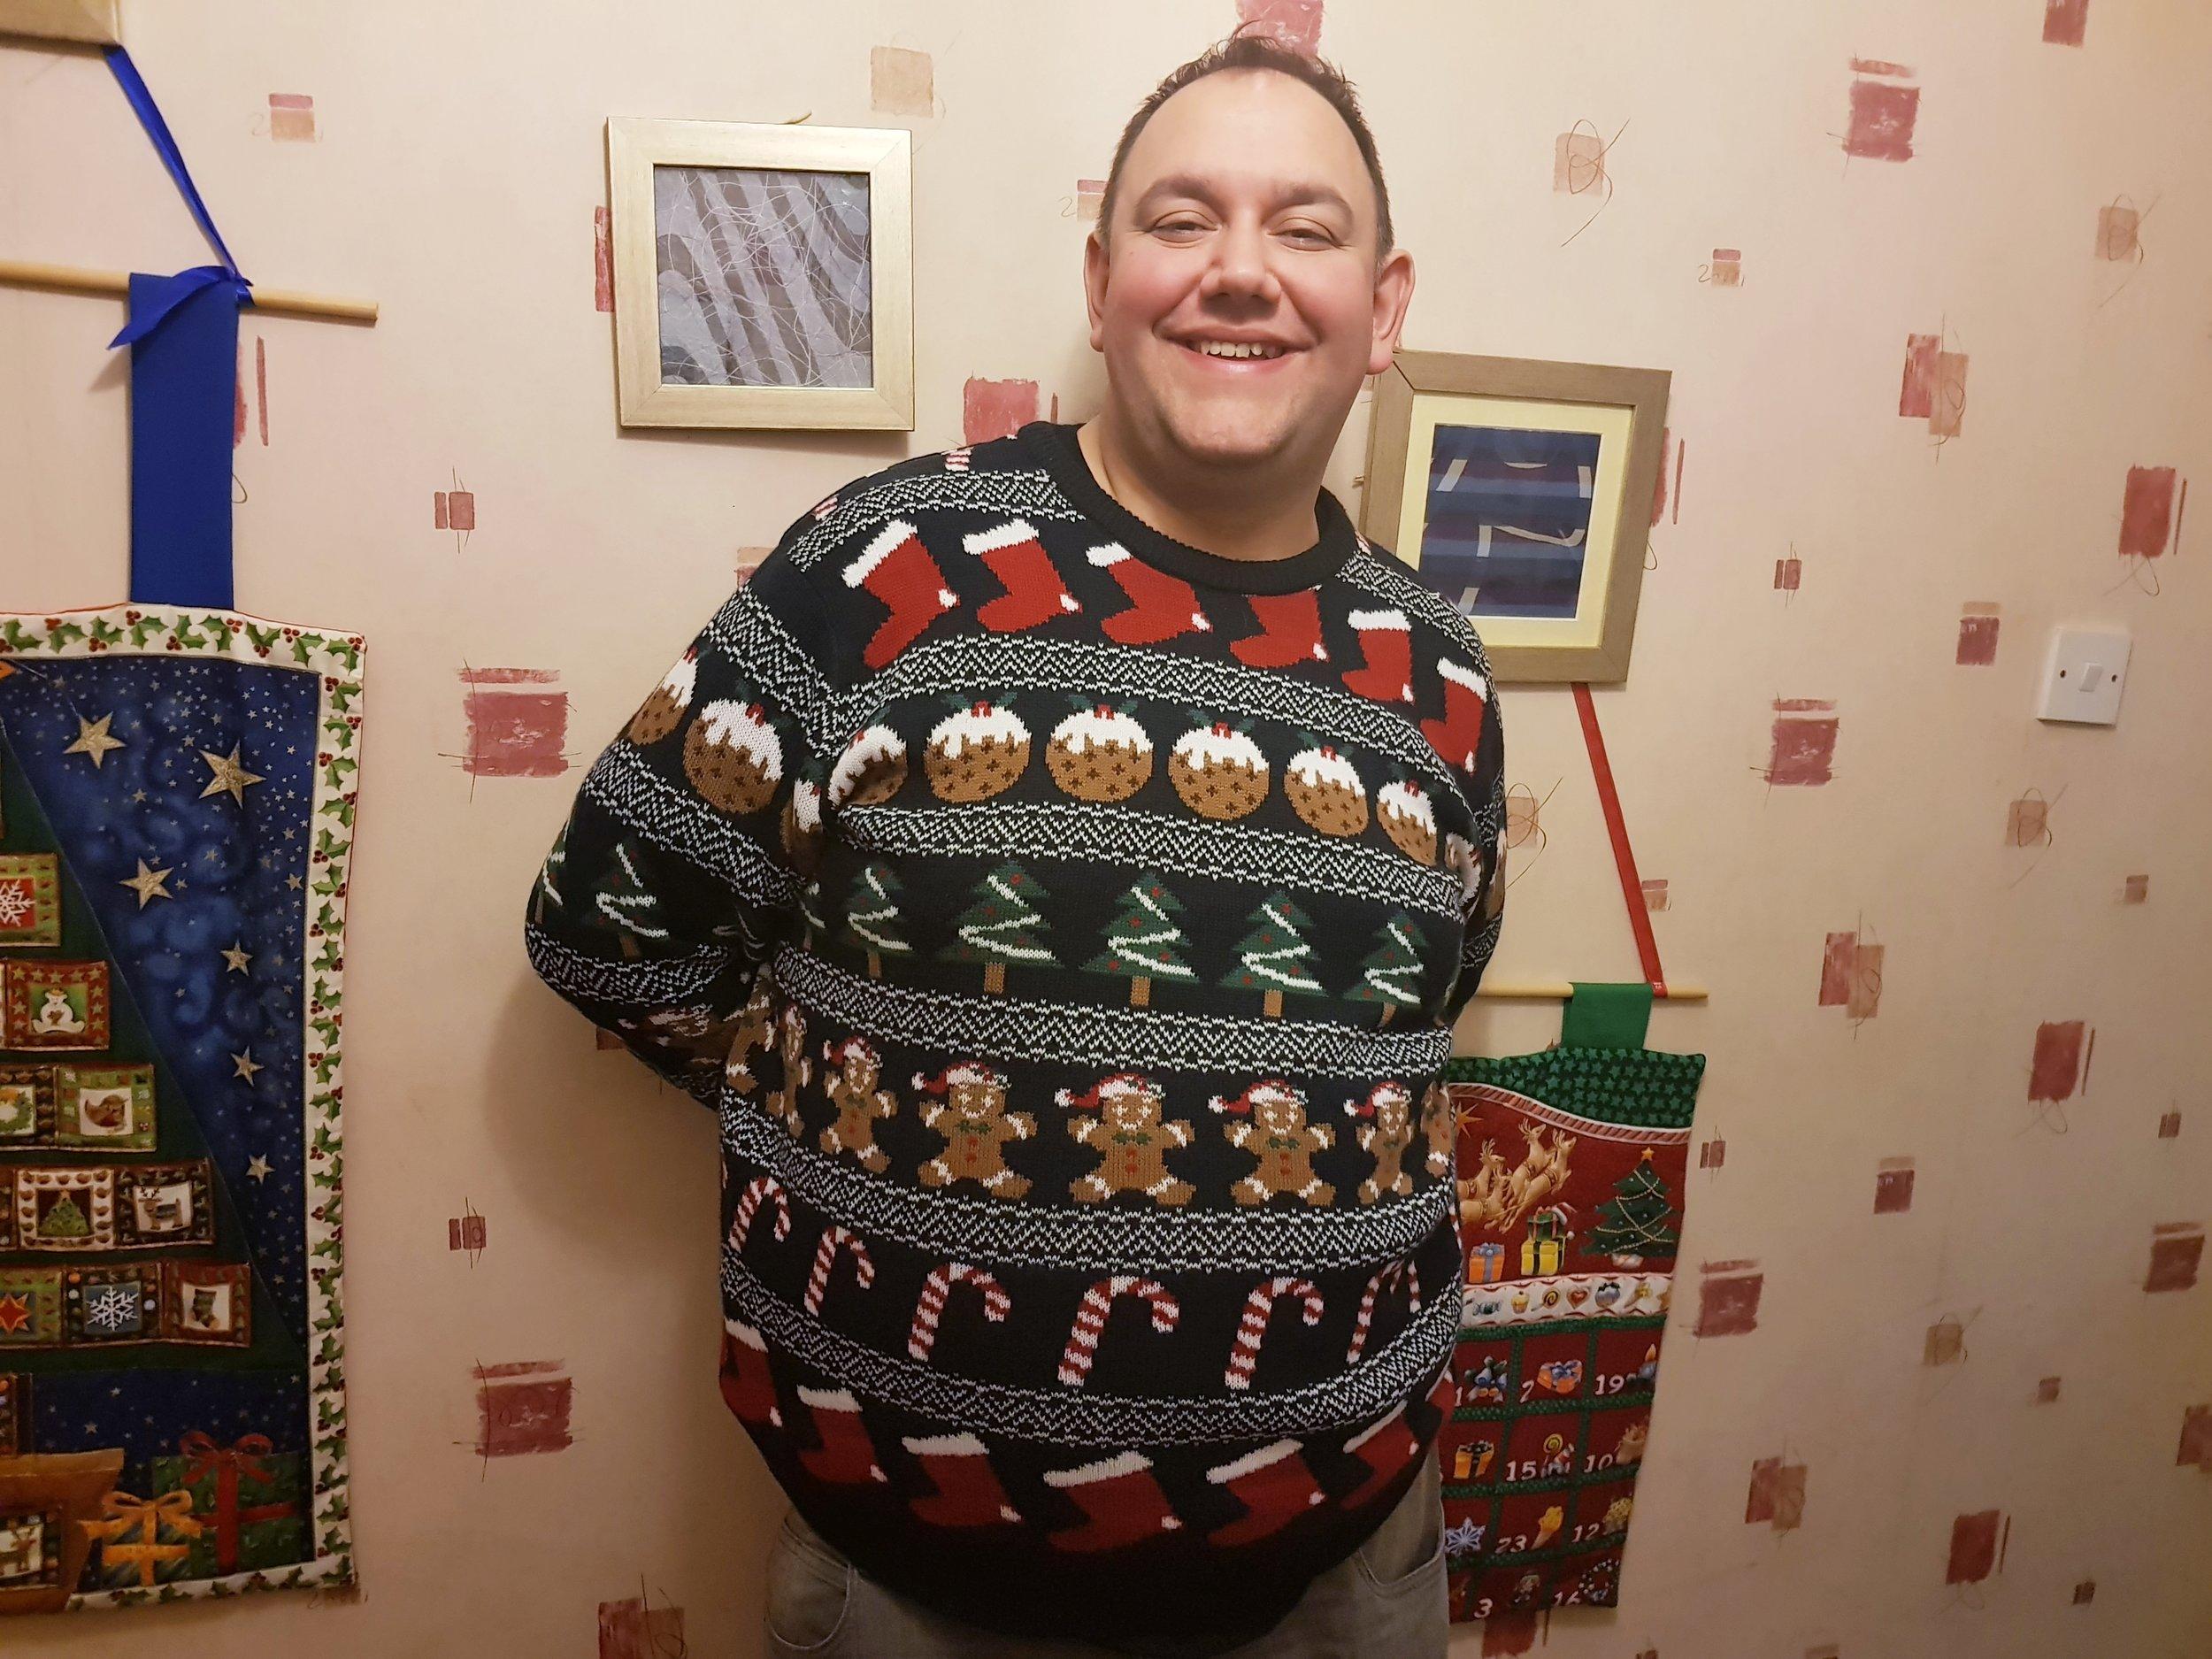 John in a Sainsbury's TU Christmas jumper